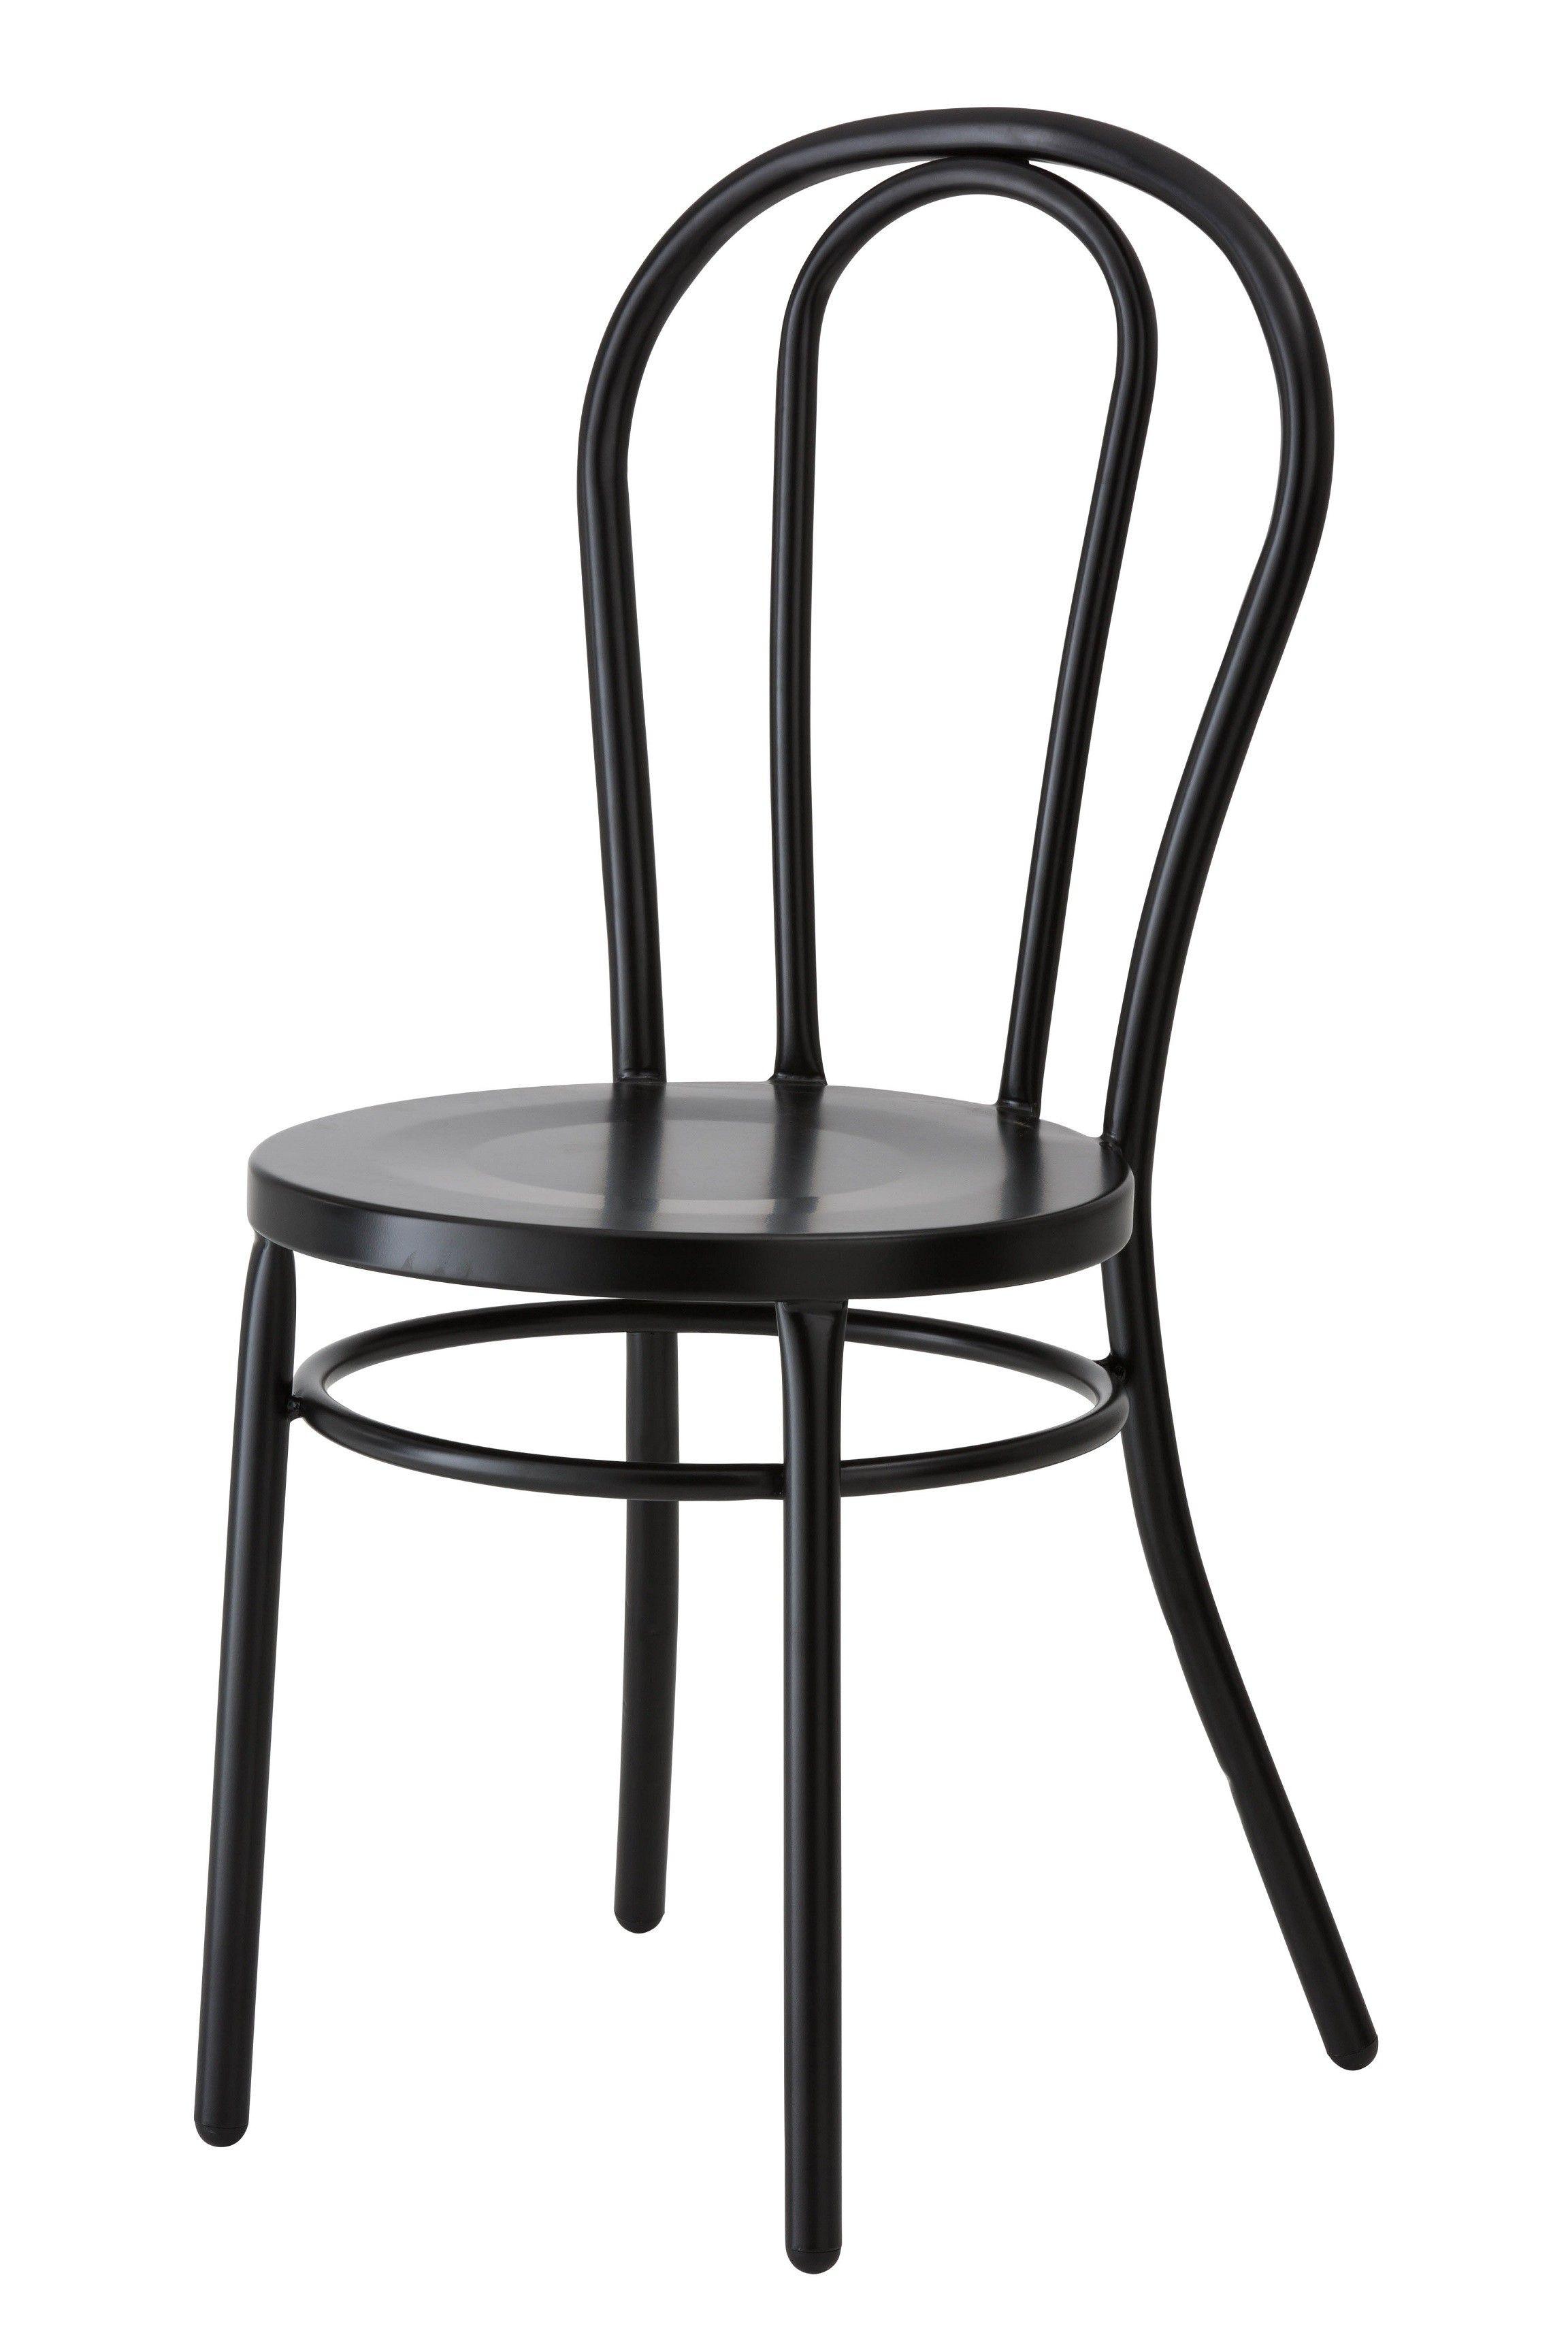 Paris Bentwood Steel Chair Reproduction Matt Black